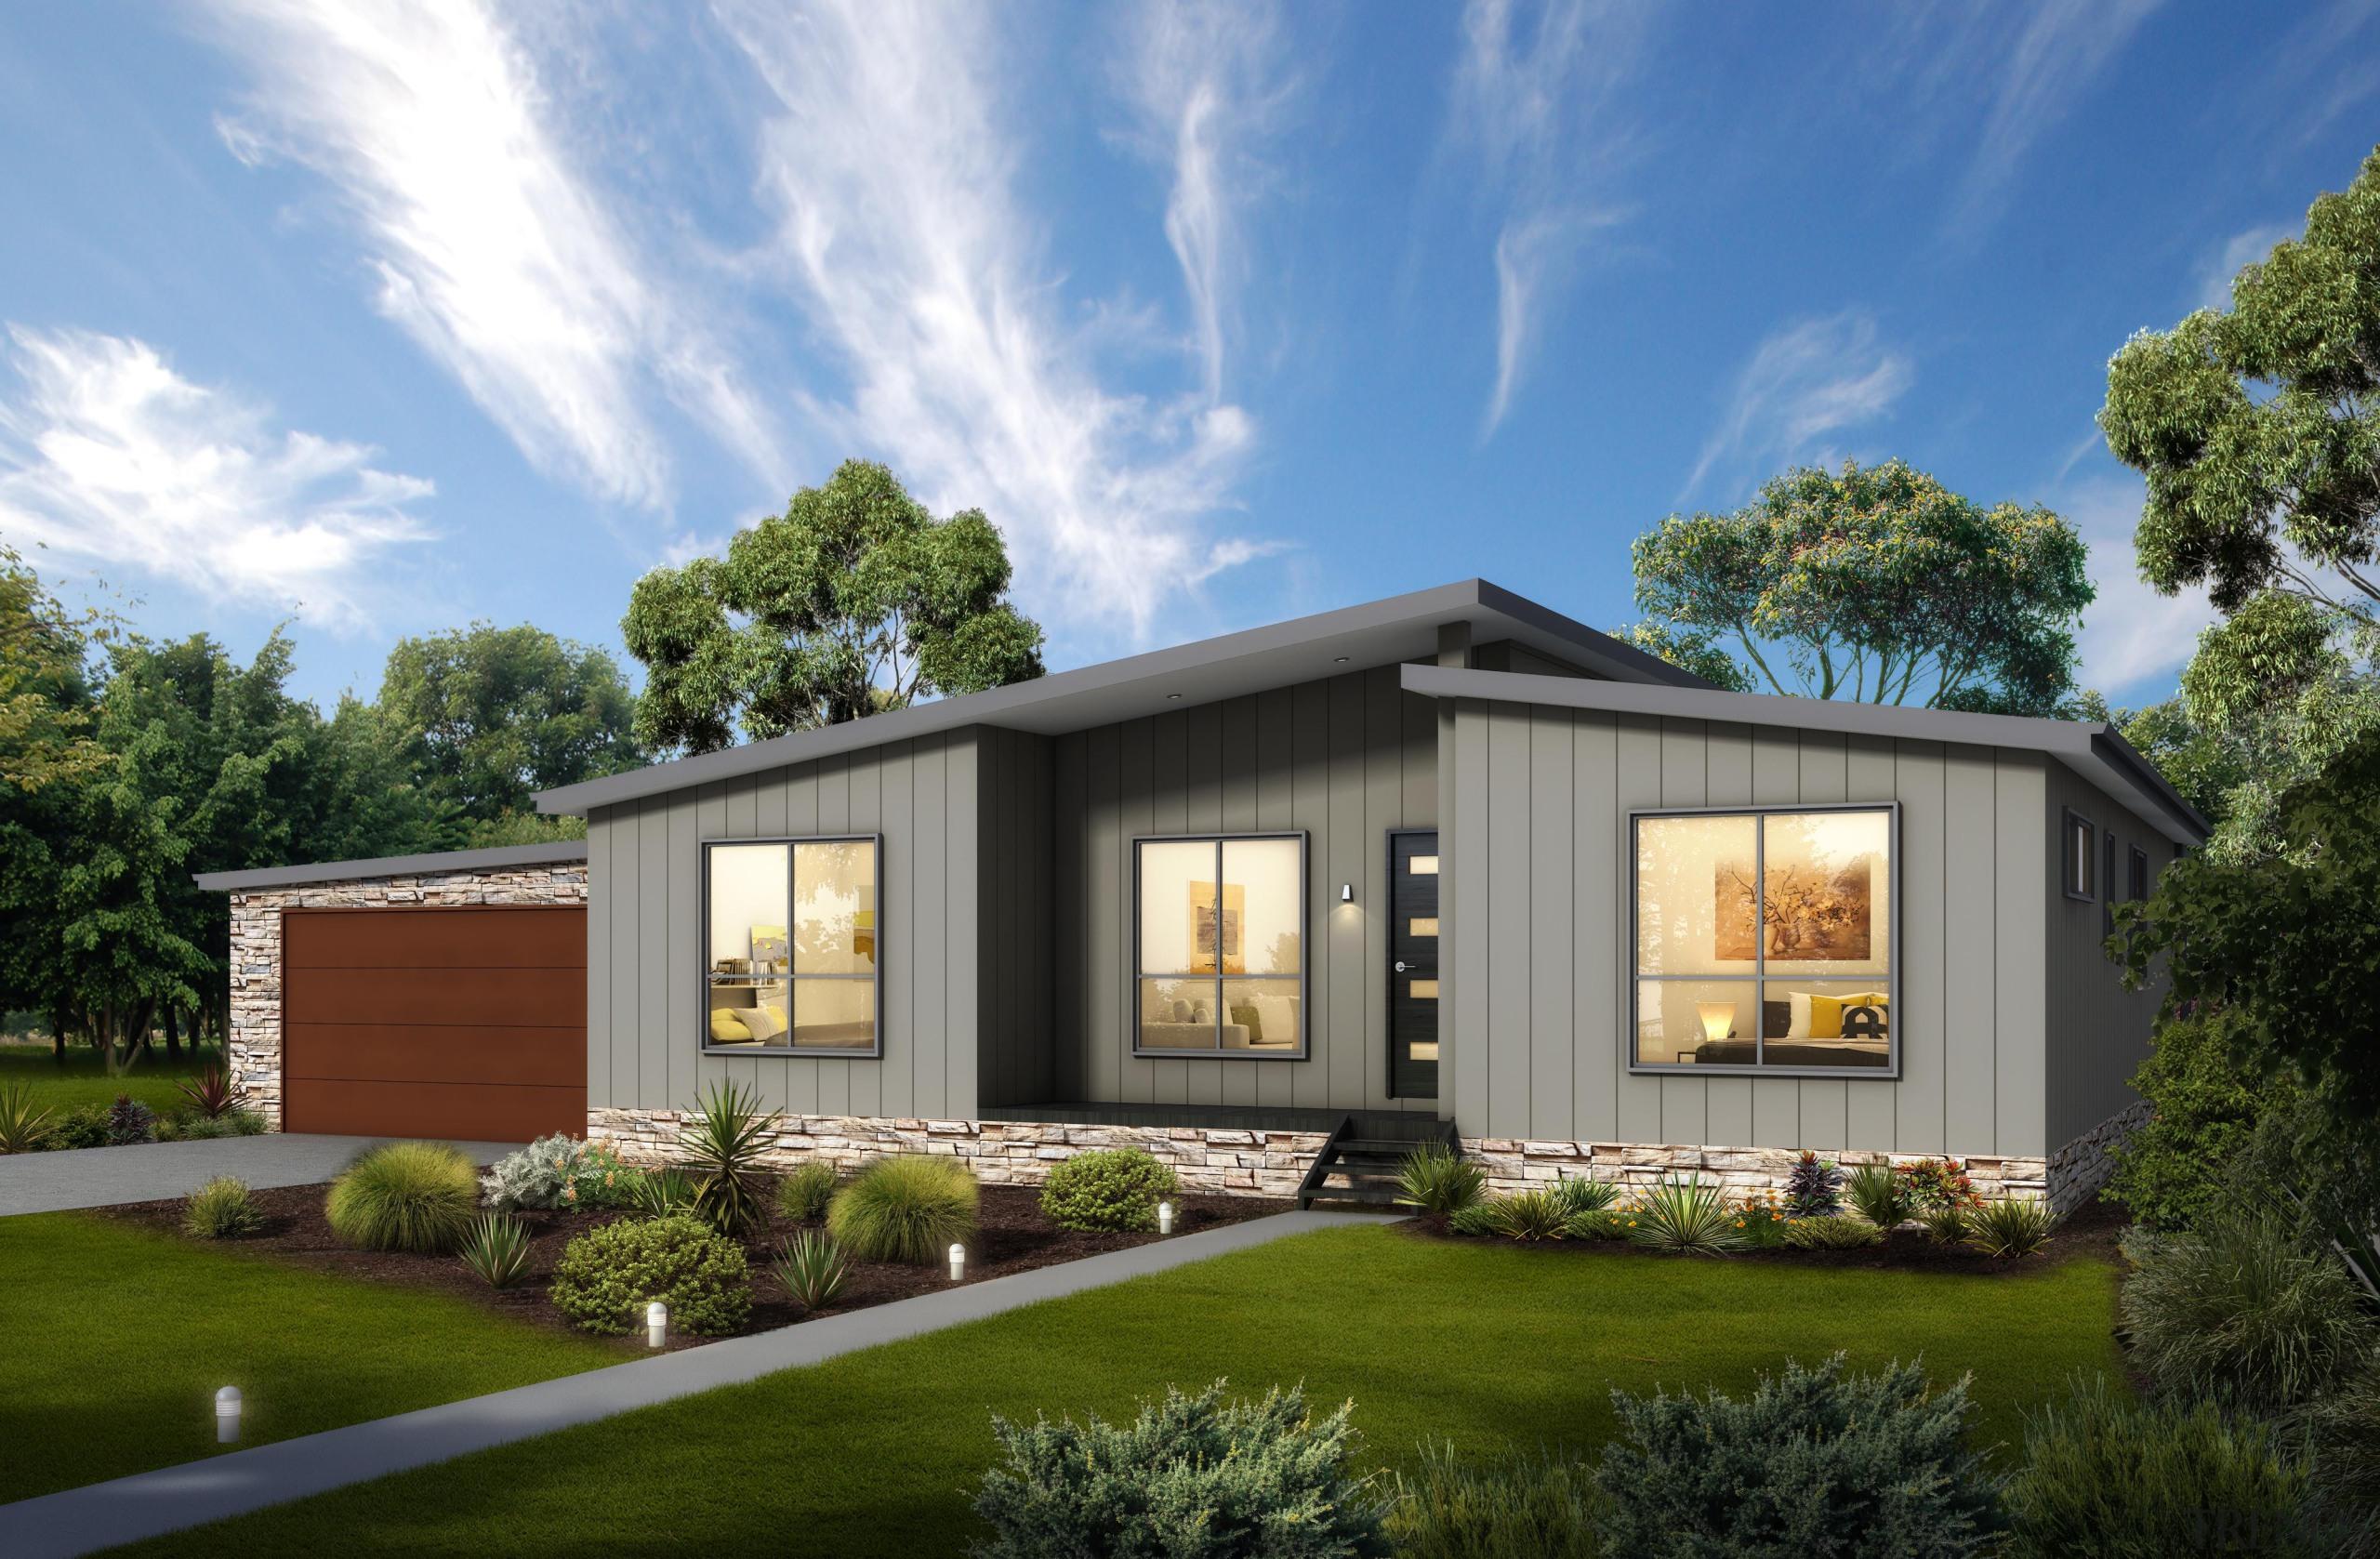 12.0 m x 12.0 mBedrooms: 3Bathrooms: 2Home: 139.1 cottage, elevation, estate, facade, farmhouse, home, house, landscape, property, real estate, brown